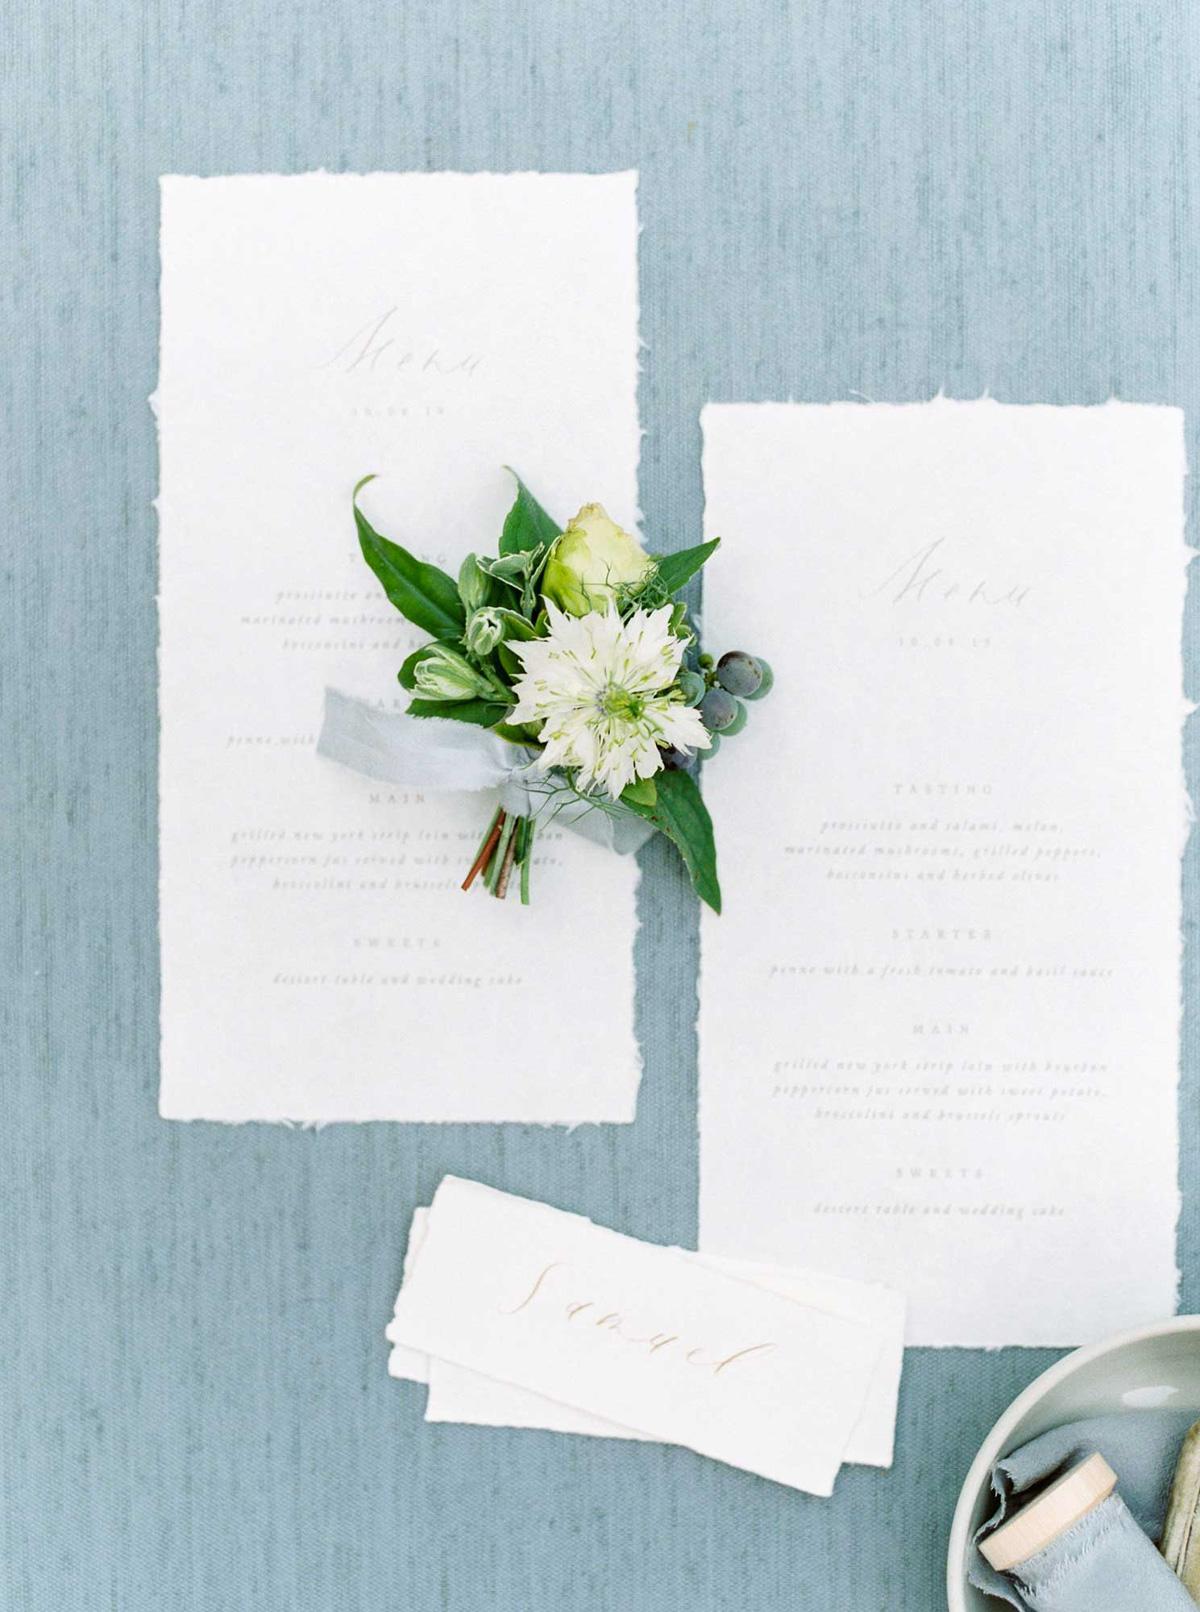 kayla-yestal-vineyard-bride-swish-list-woodland-weddings-niagara-wedding-editorial-9.jpg